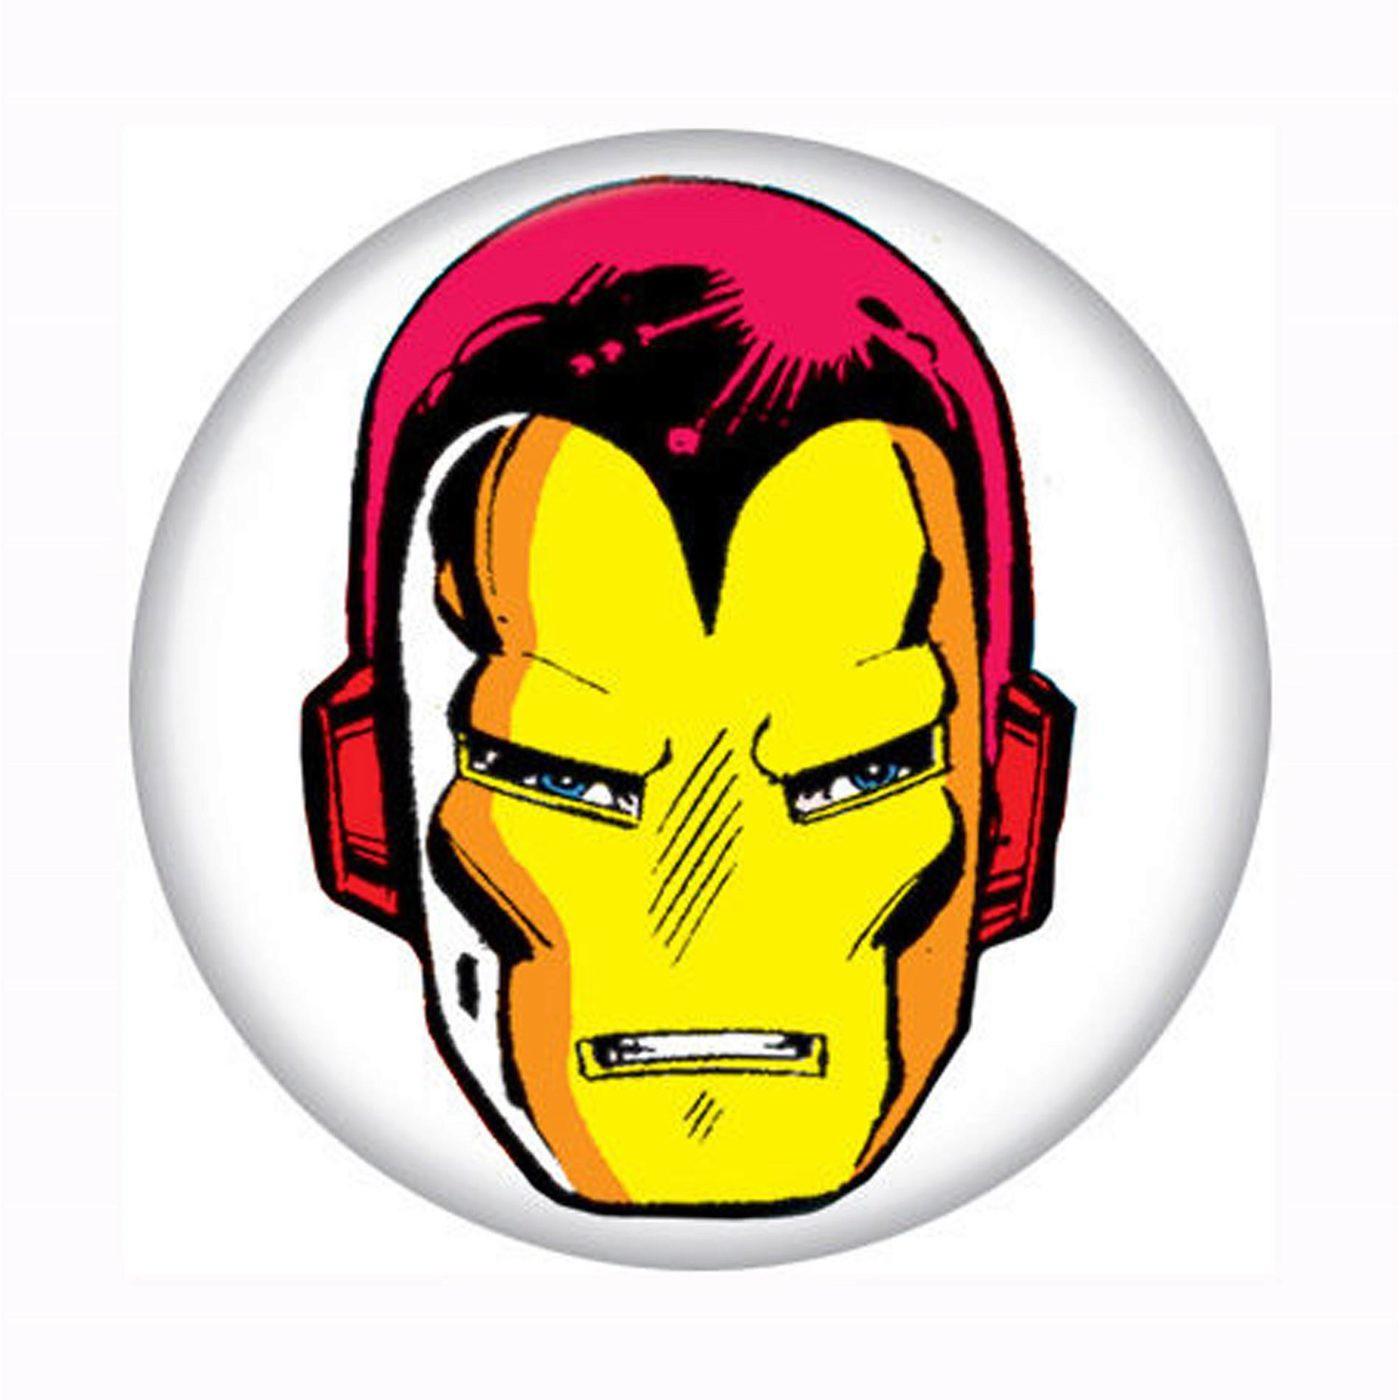 Iron Man Head Button